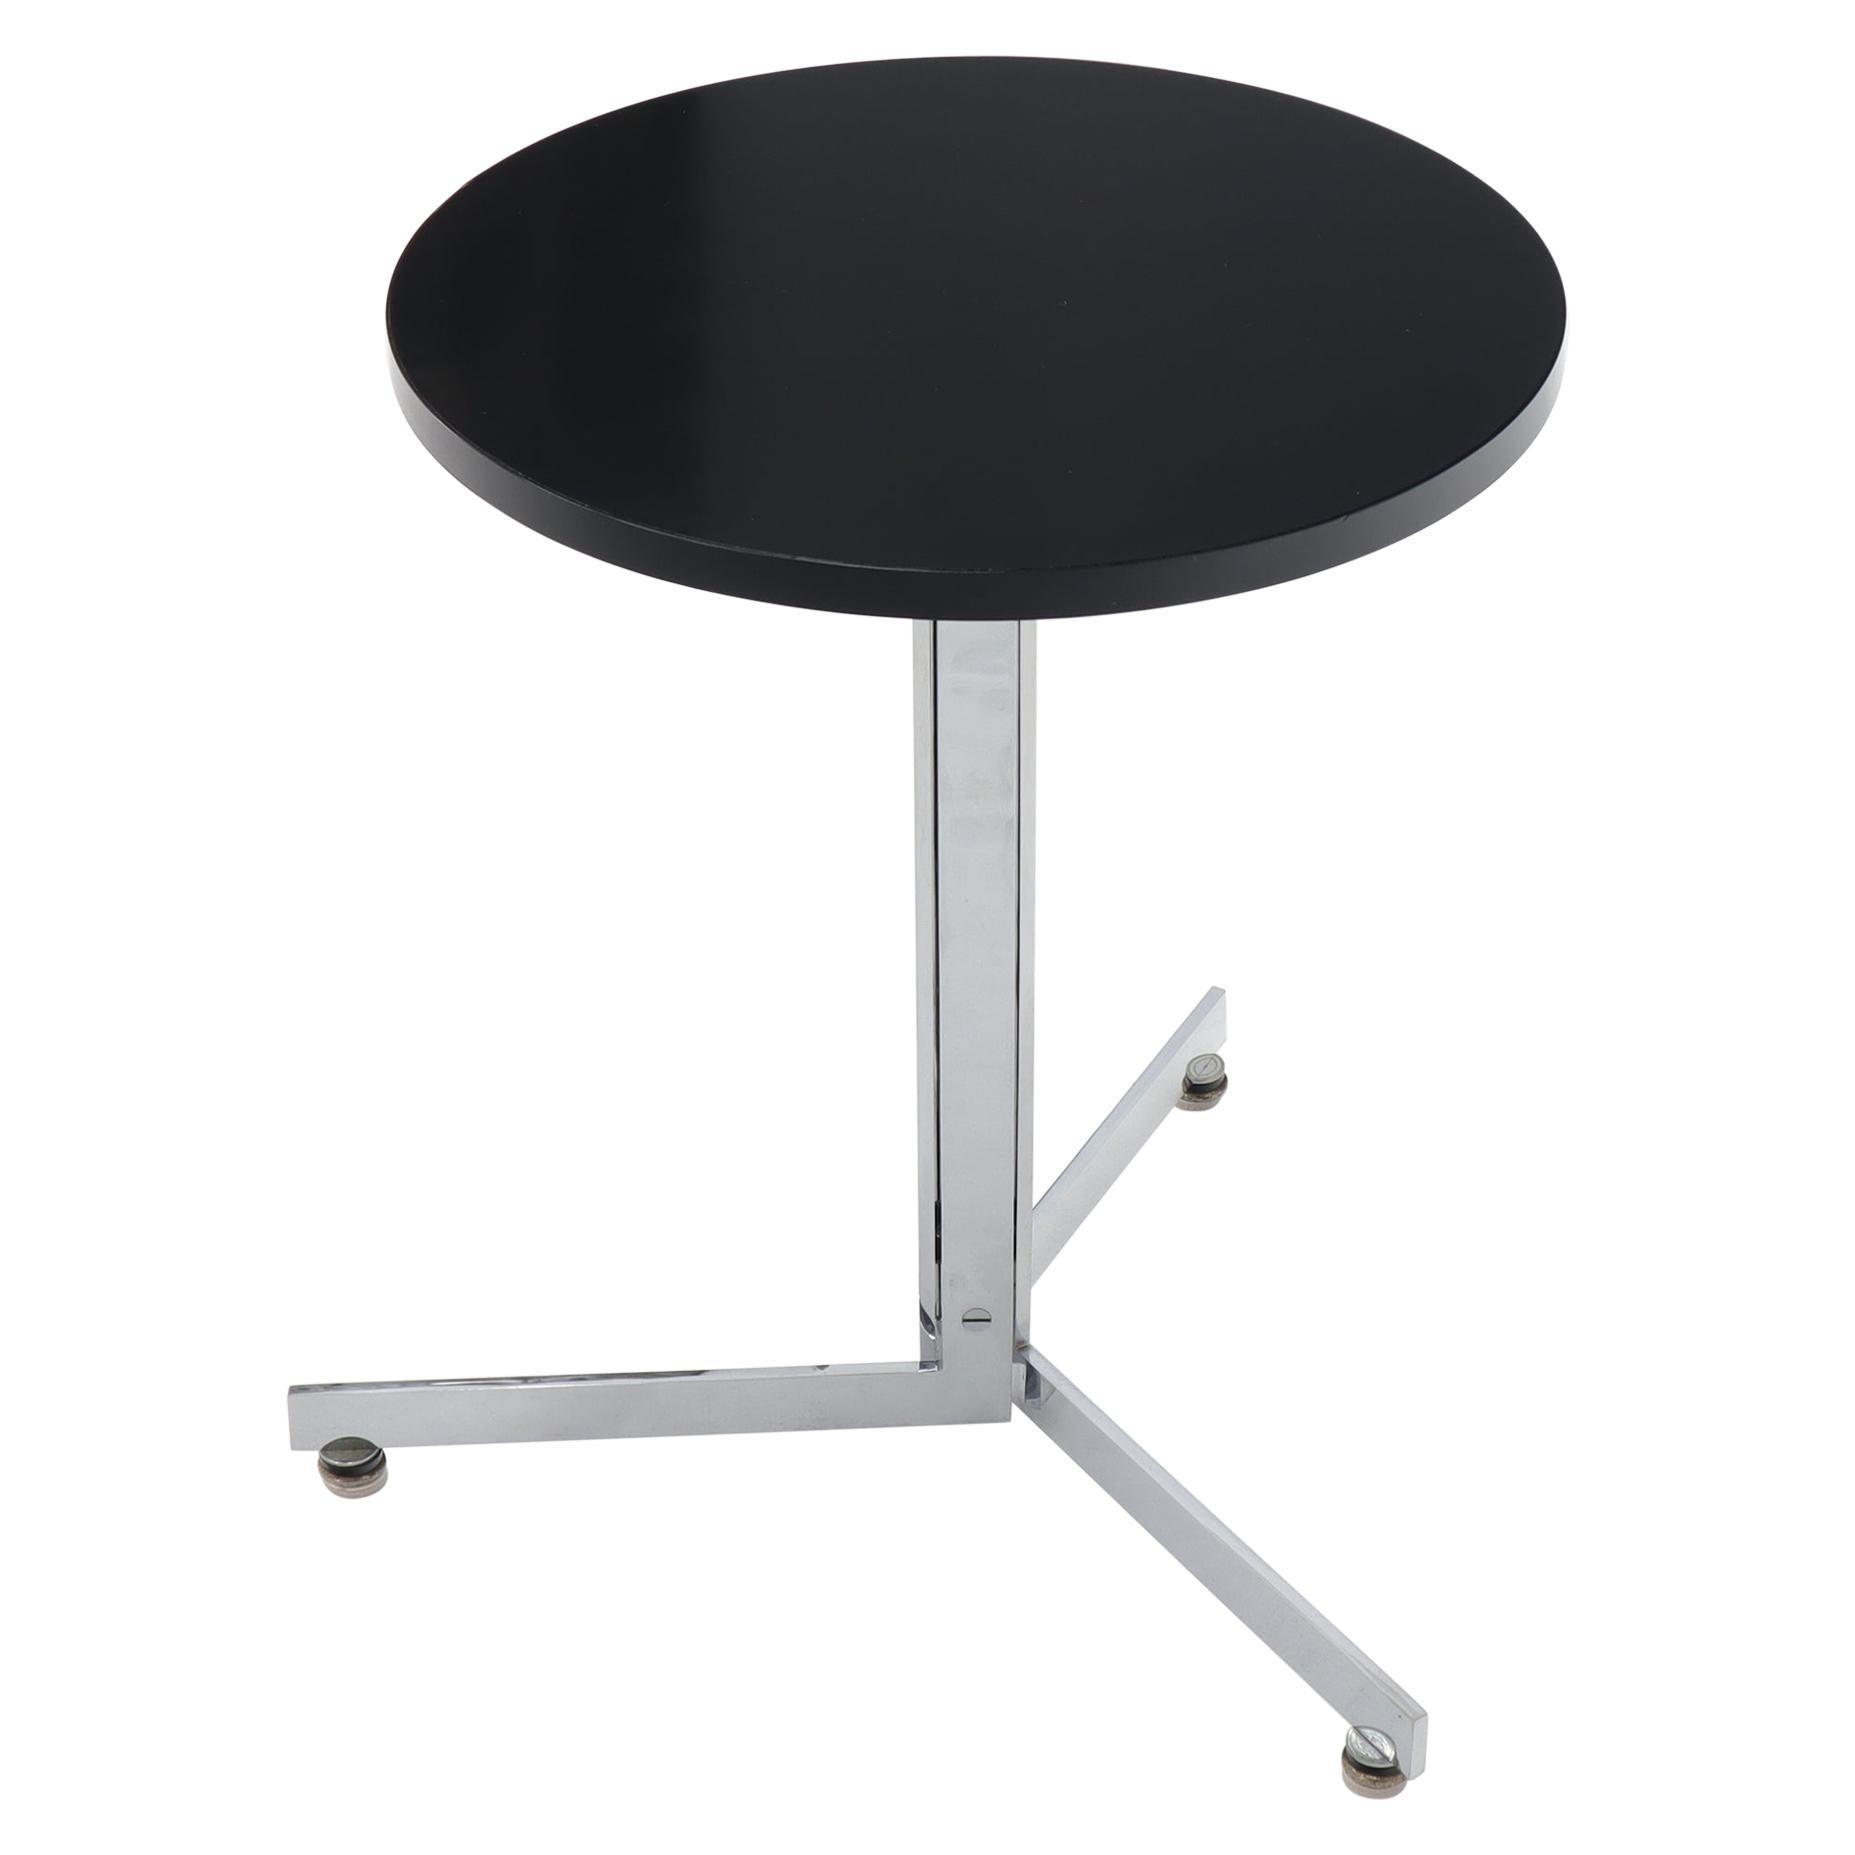 Bauhaus Chrome Triangle Base Legs Black Ebonized Round Top End Side Table